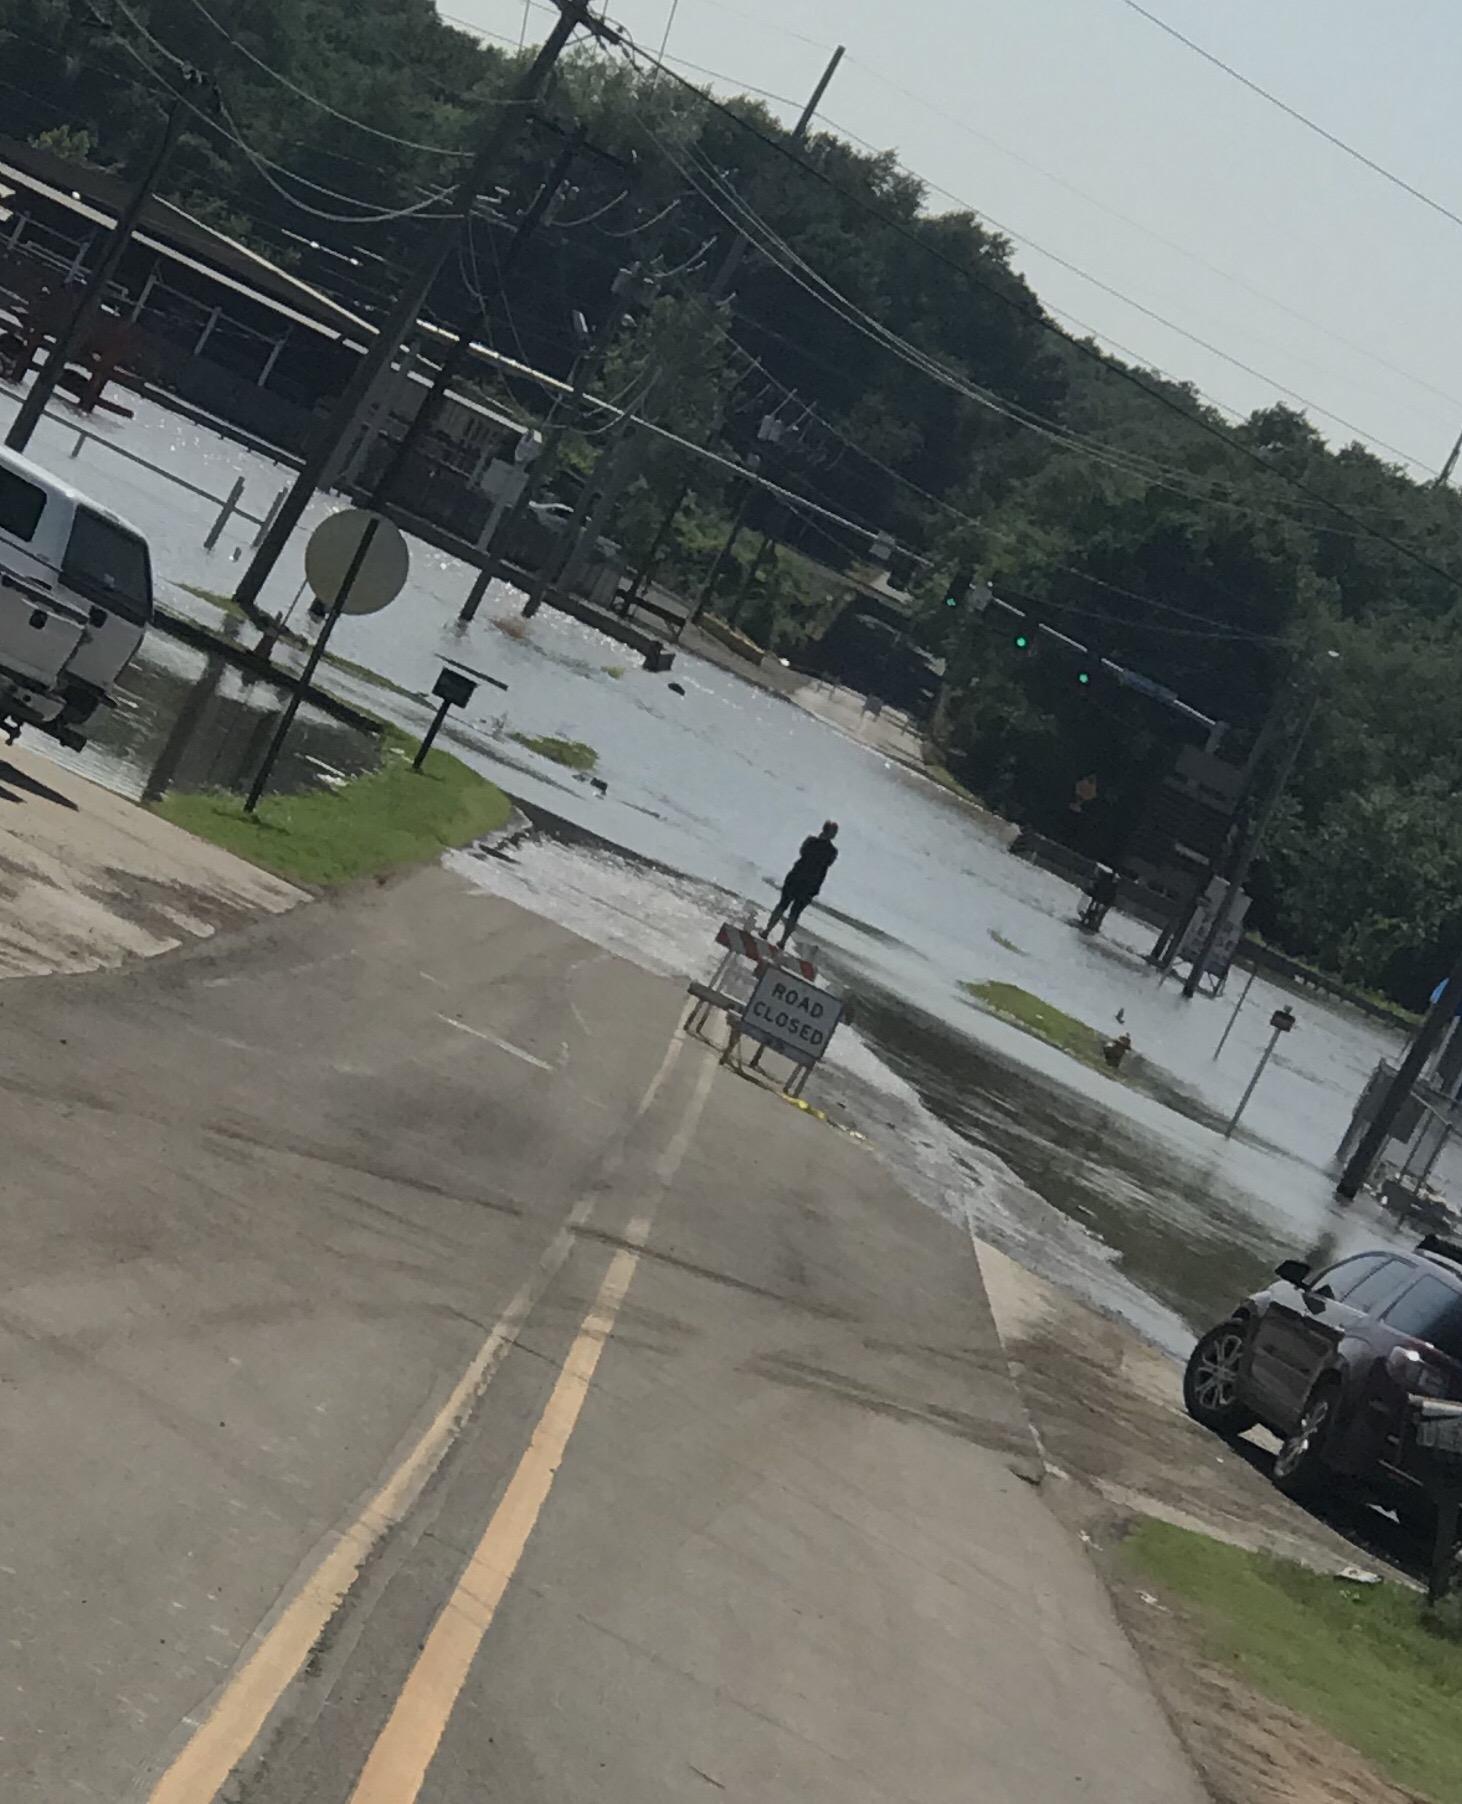 Flooding of Plunkett Distributing (Courtesy of Jackson Kindy)